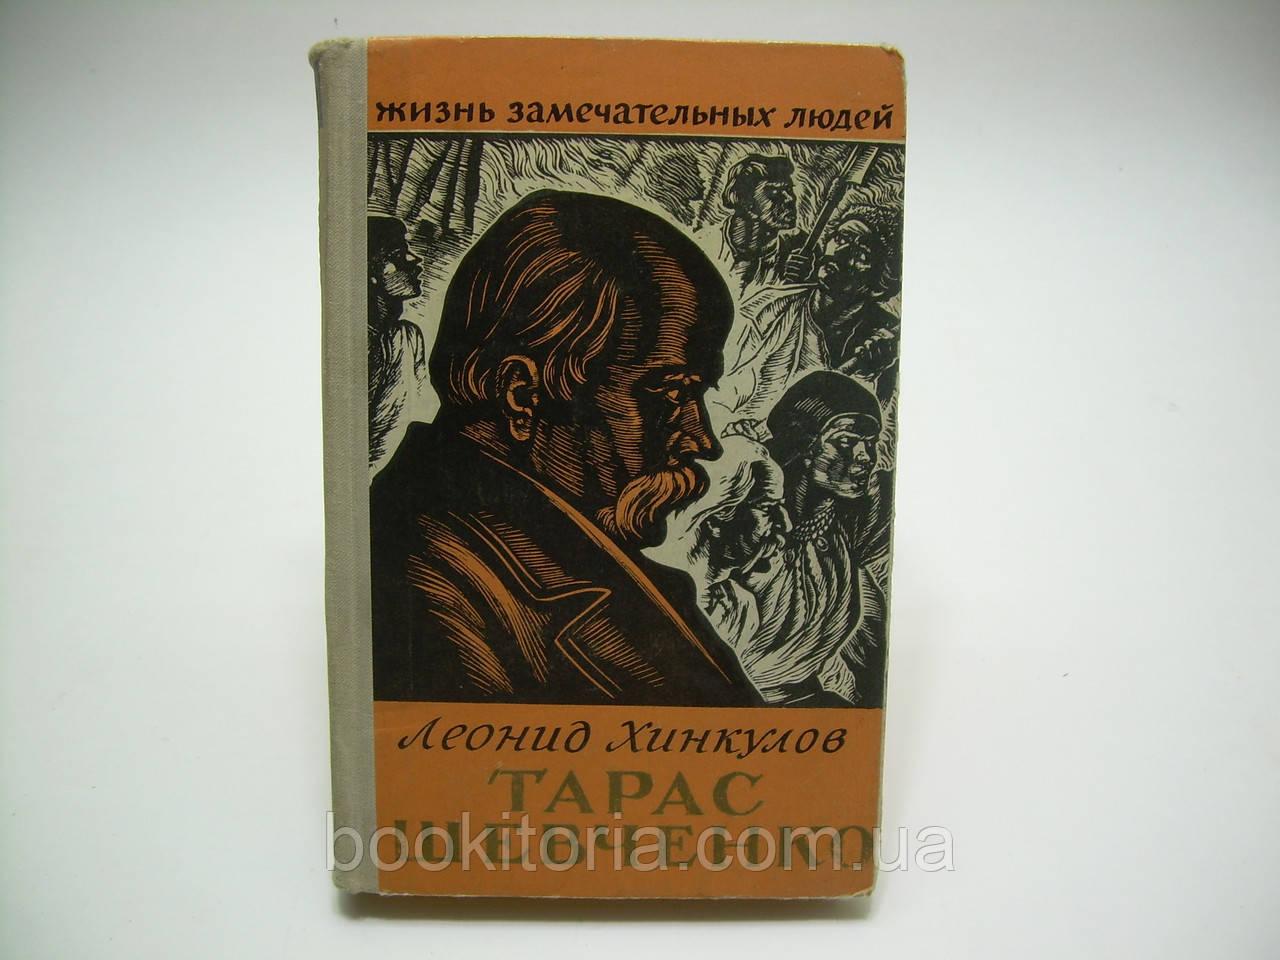 Хинкулов Л. Тарас Шевченко (б/у).